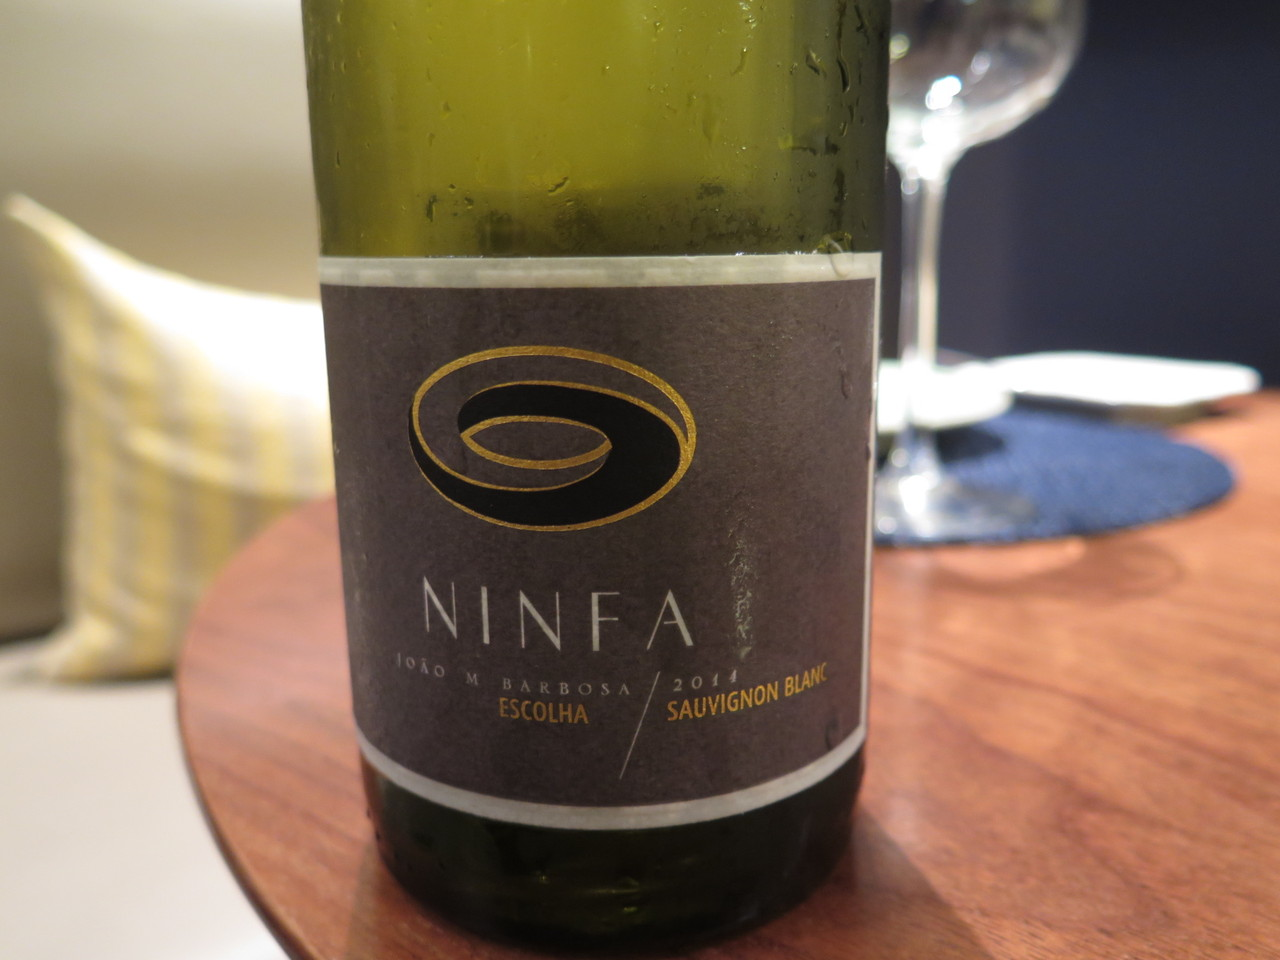 Ninfa Escolha Sauvignon Blanc 2014